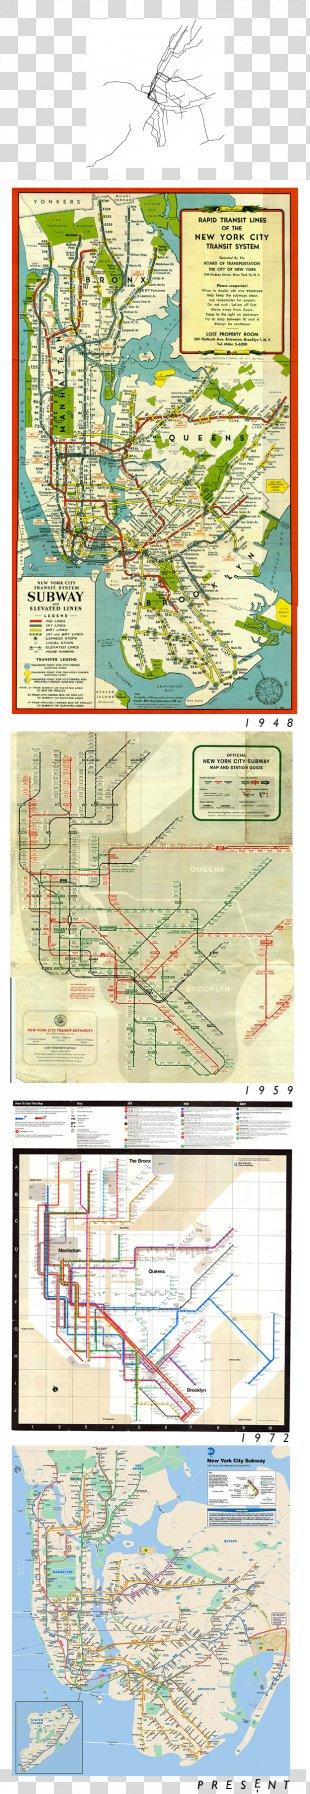 New York City Subway Paper Printing New York City Transit Authority - New York Subway PNG